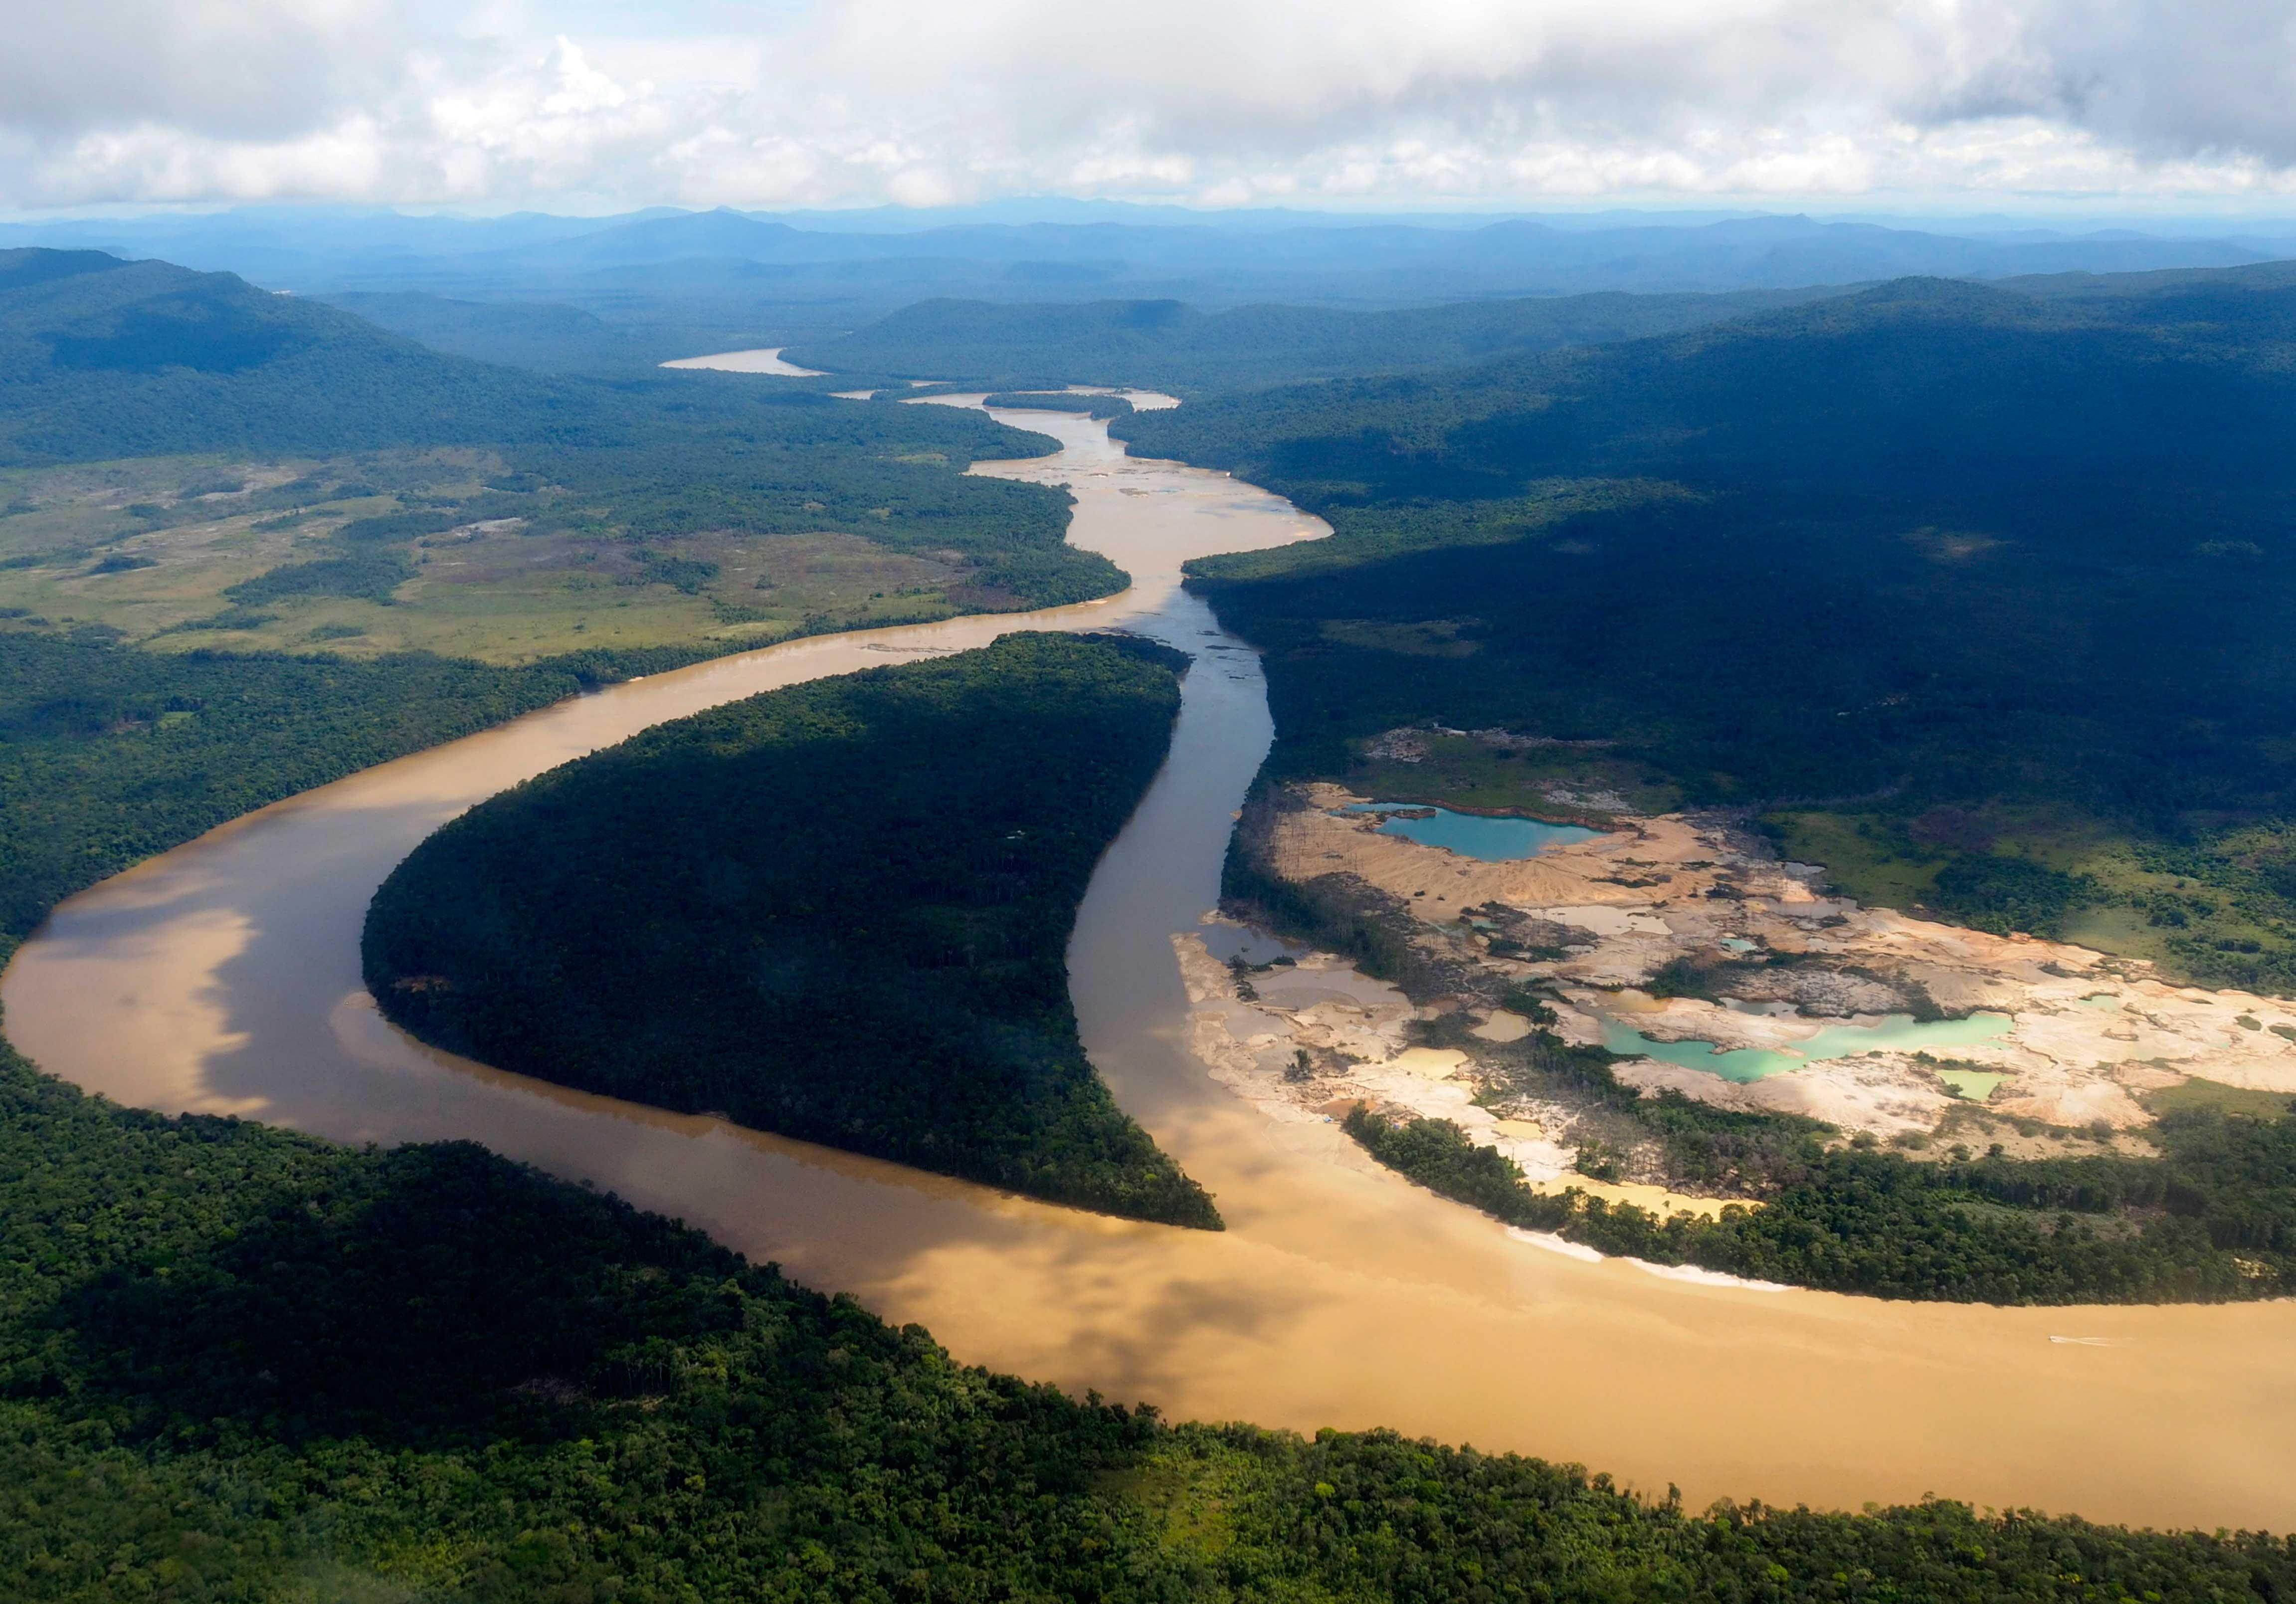 Amazonía en la encrucijada - Territorio Amazonas   Ojo Público